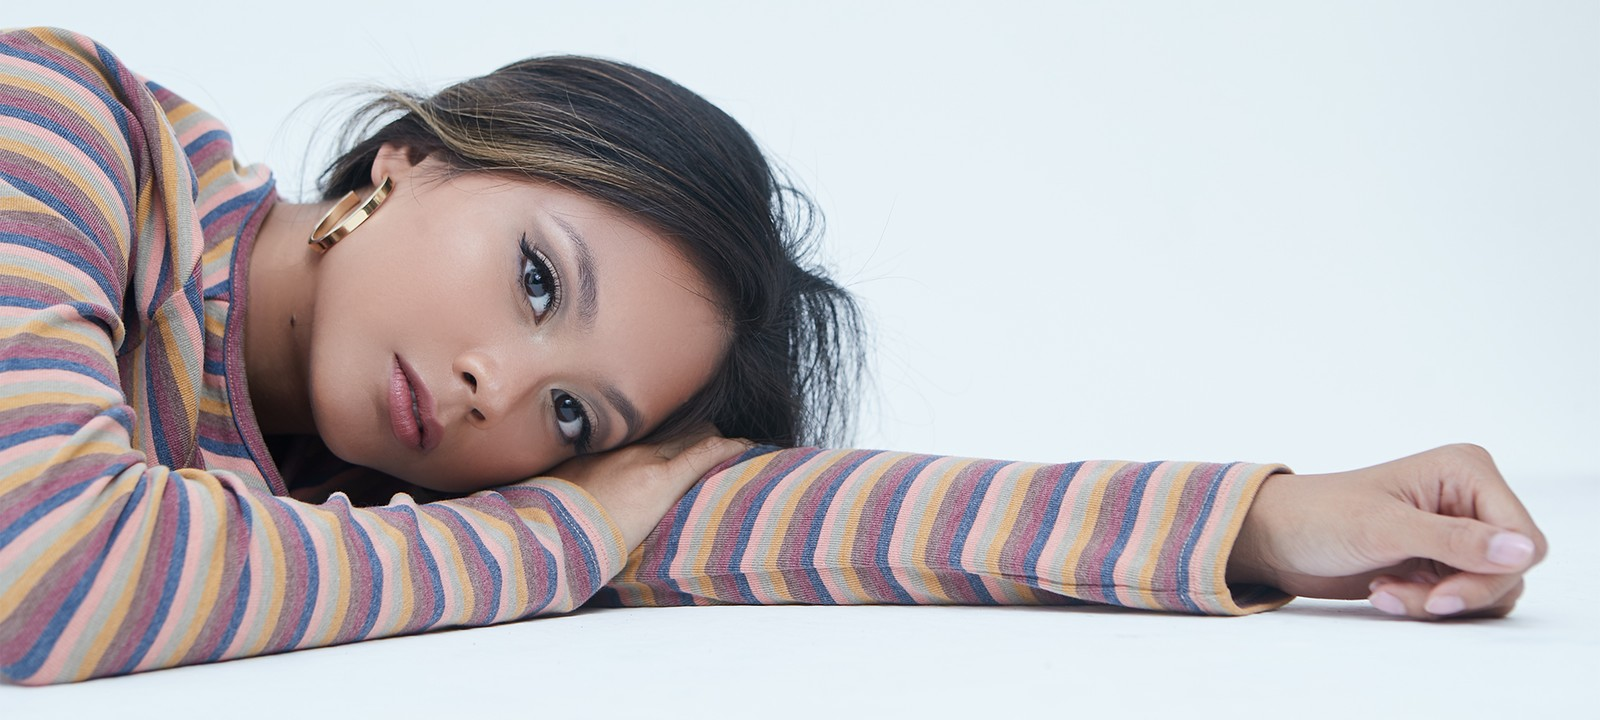 ylona garcia music pop artist 88rising all that single filipina filipino Australian Sydney